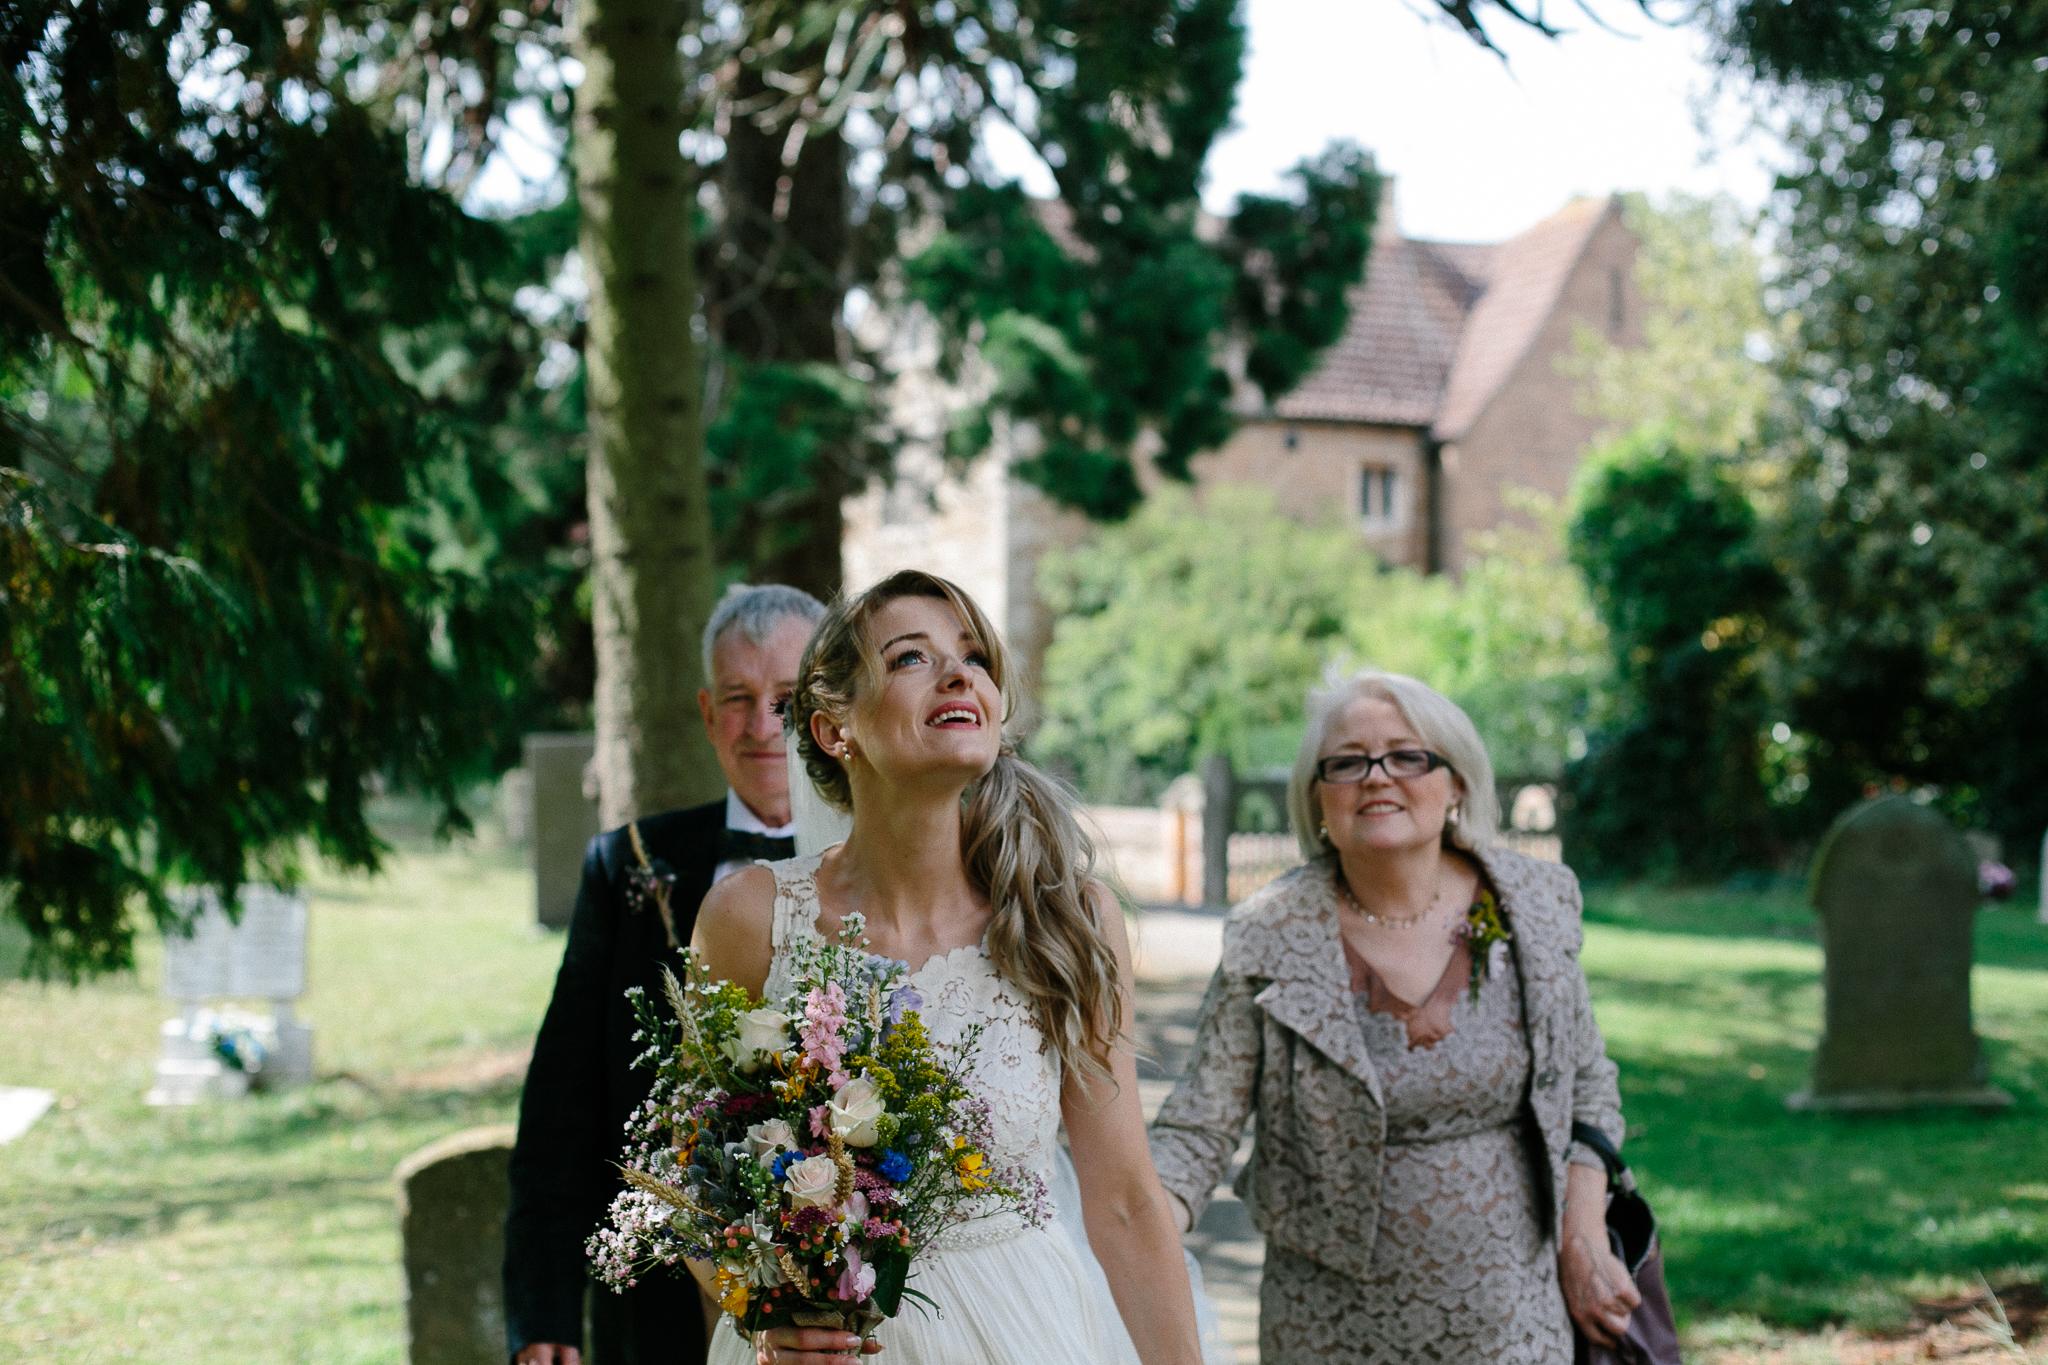 grantham_wedding_photographer-43.jpg